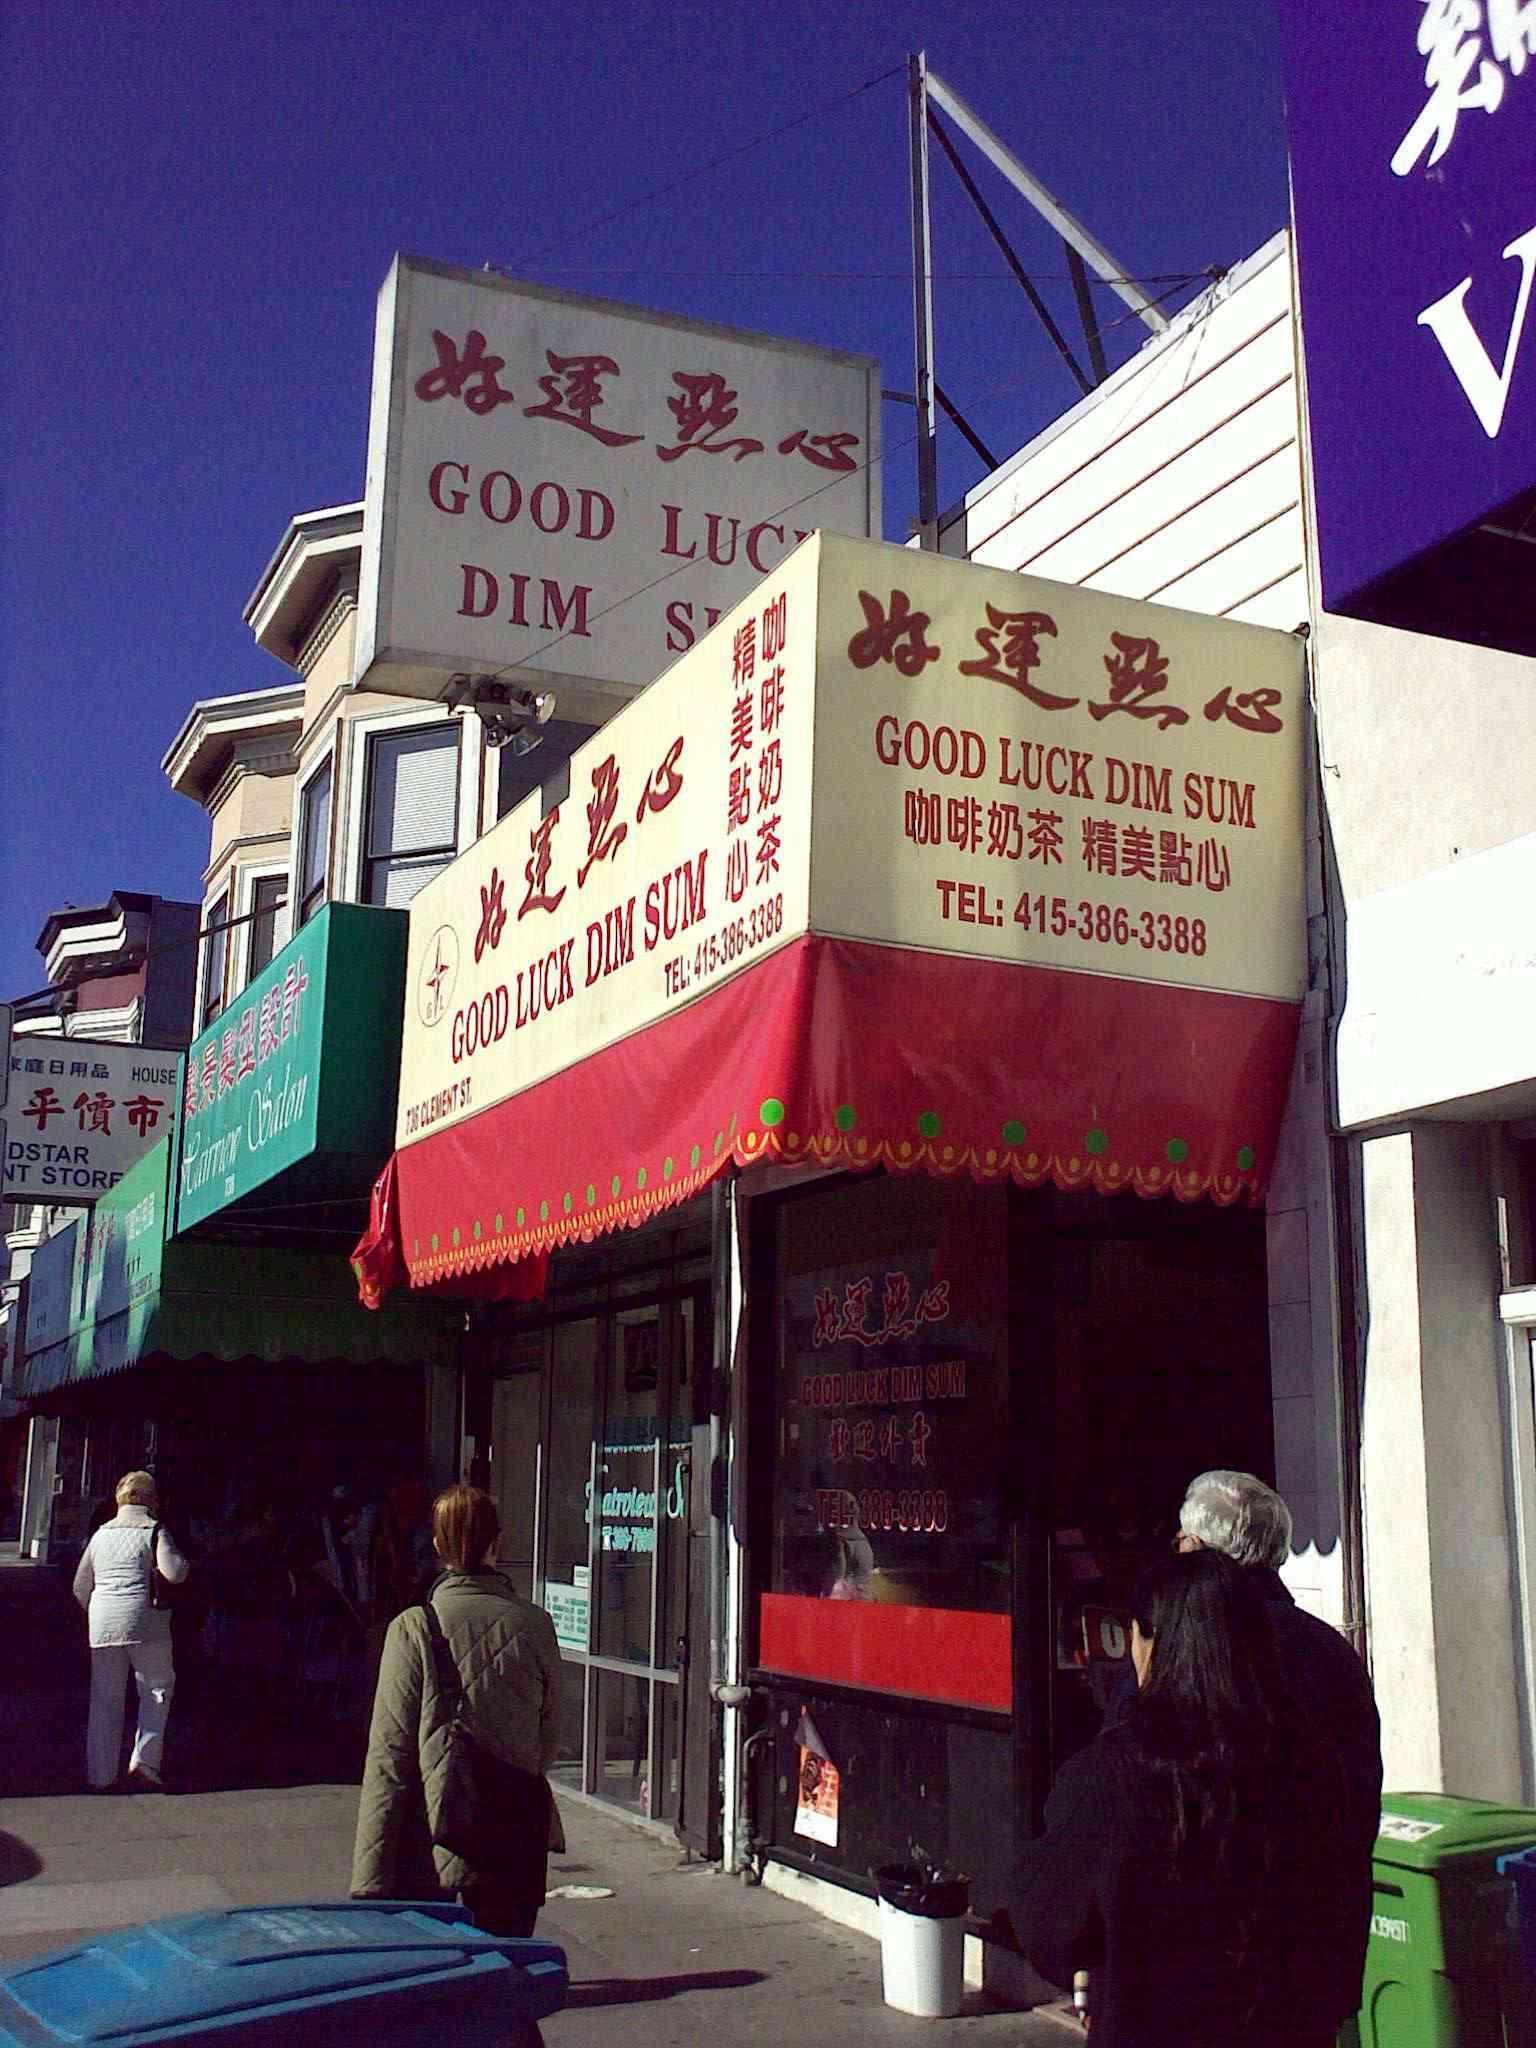 Good Luck Dim Sum entrance